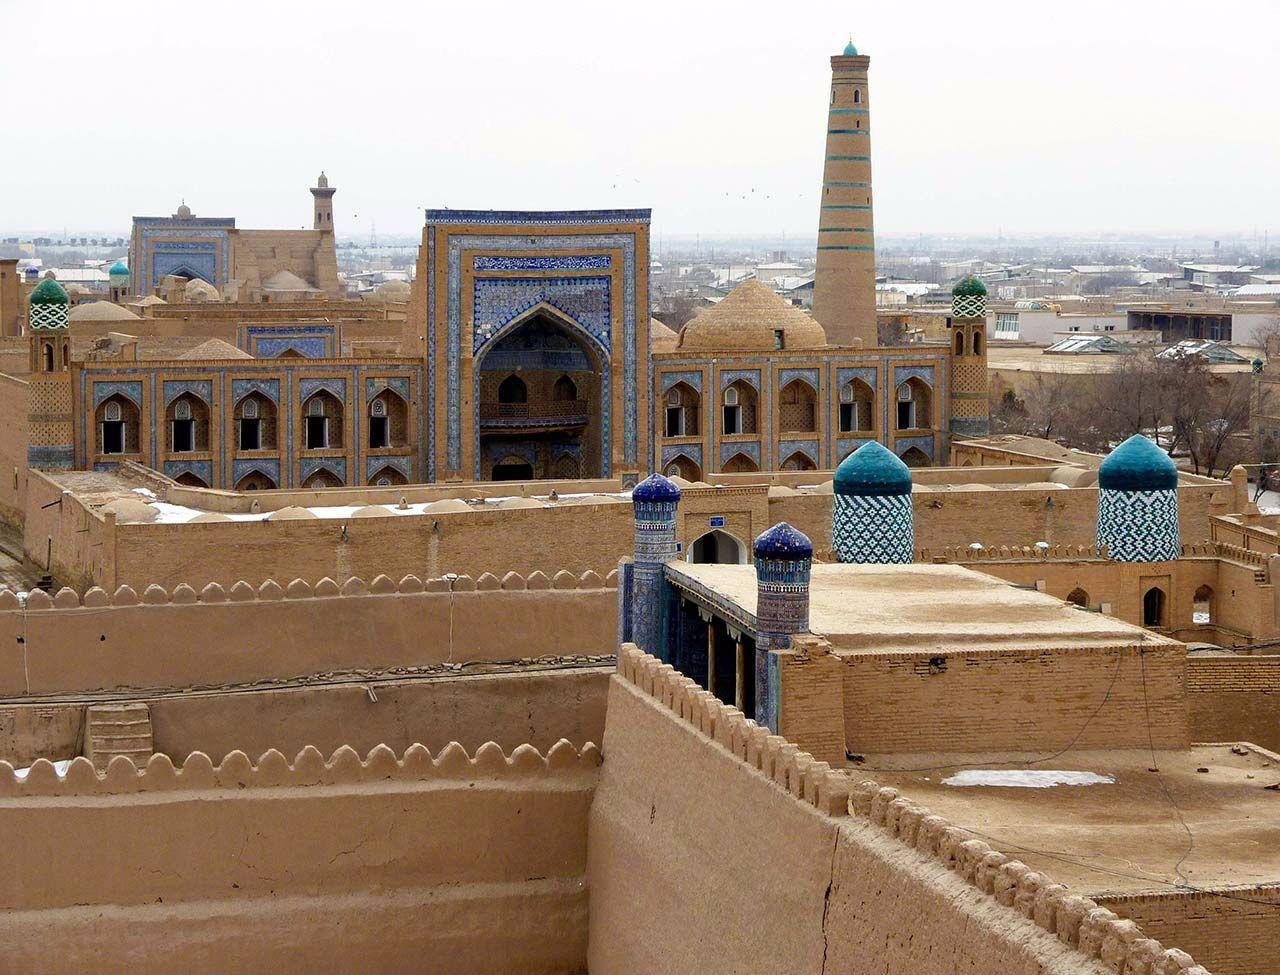 Architekturreise Usbekistan Chiwa. Bild: Ventus Reisen